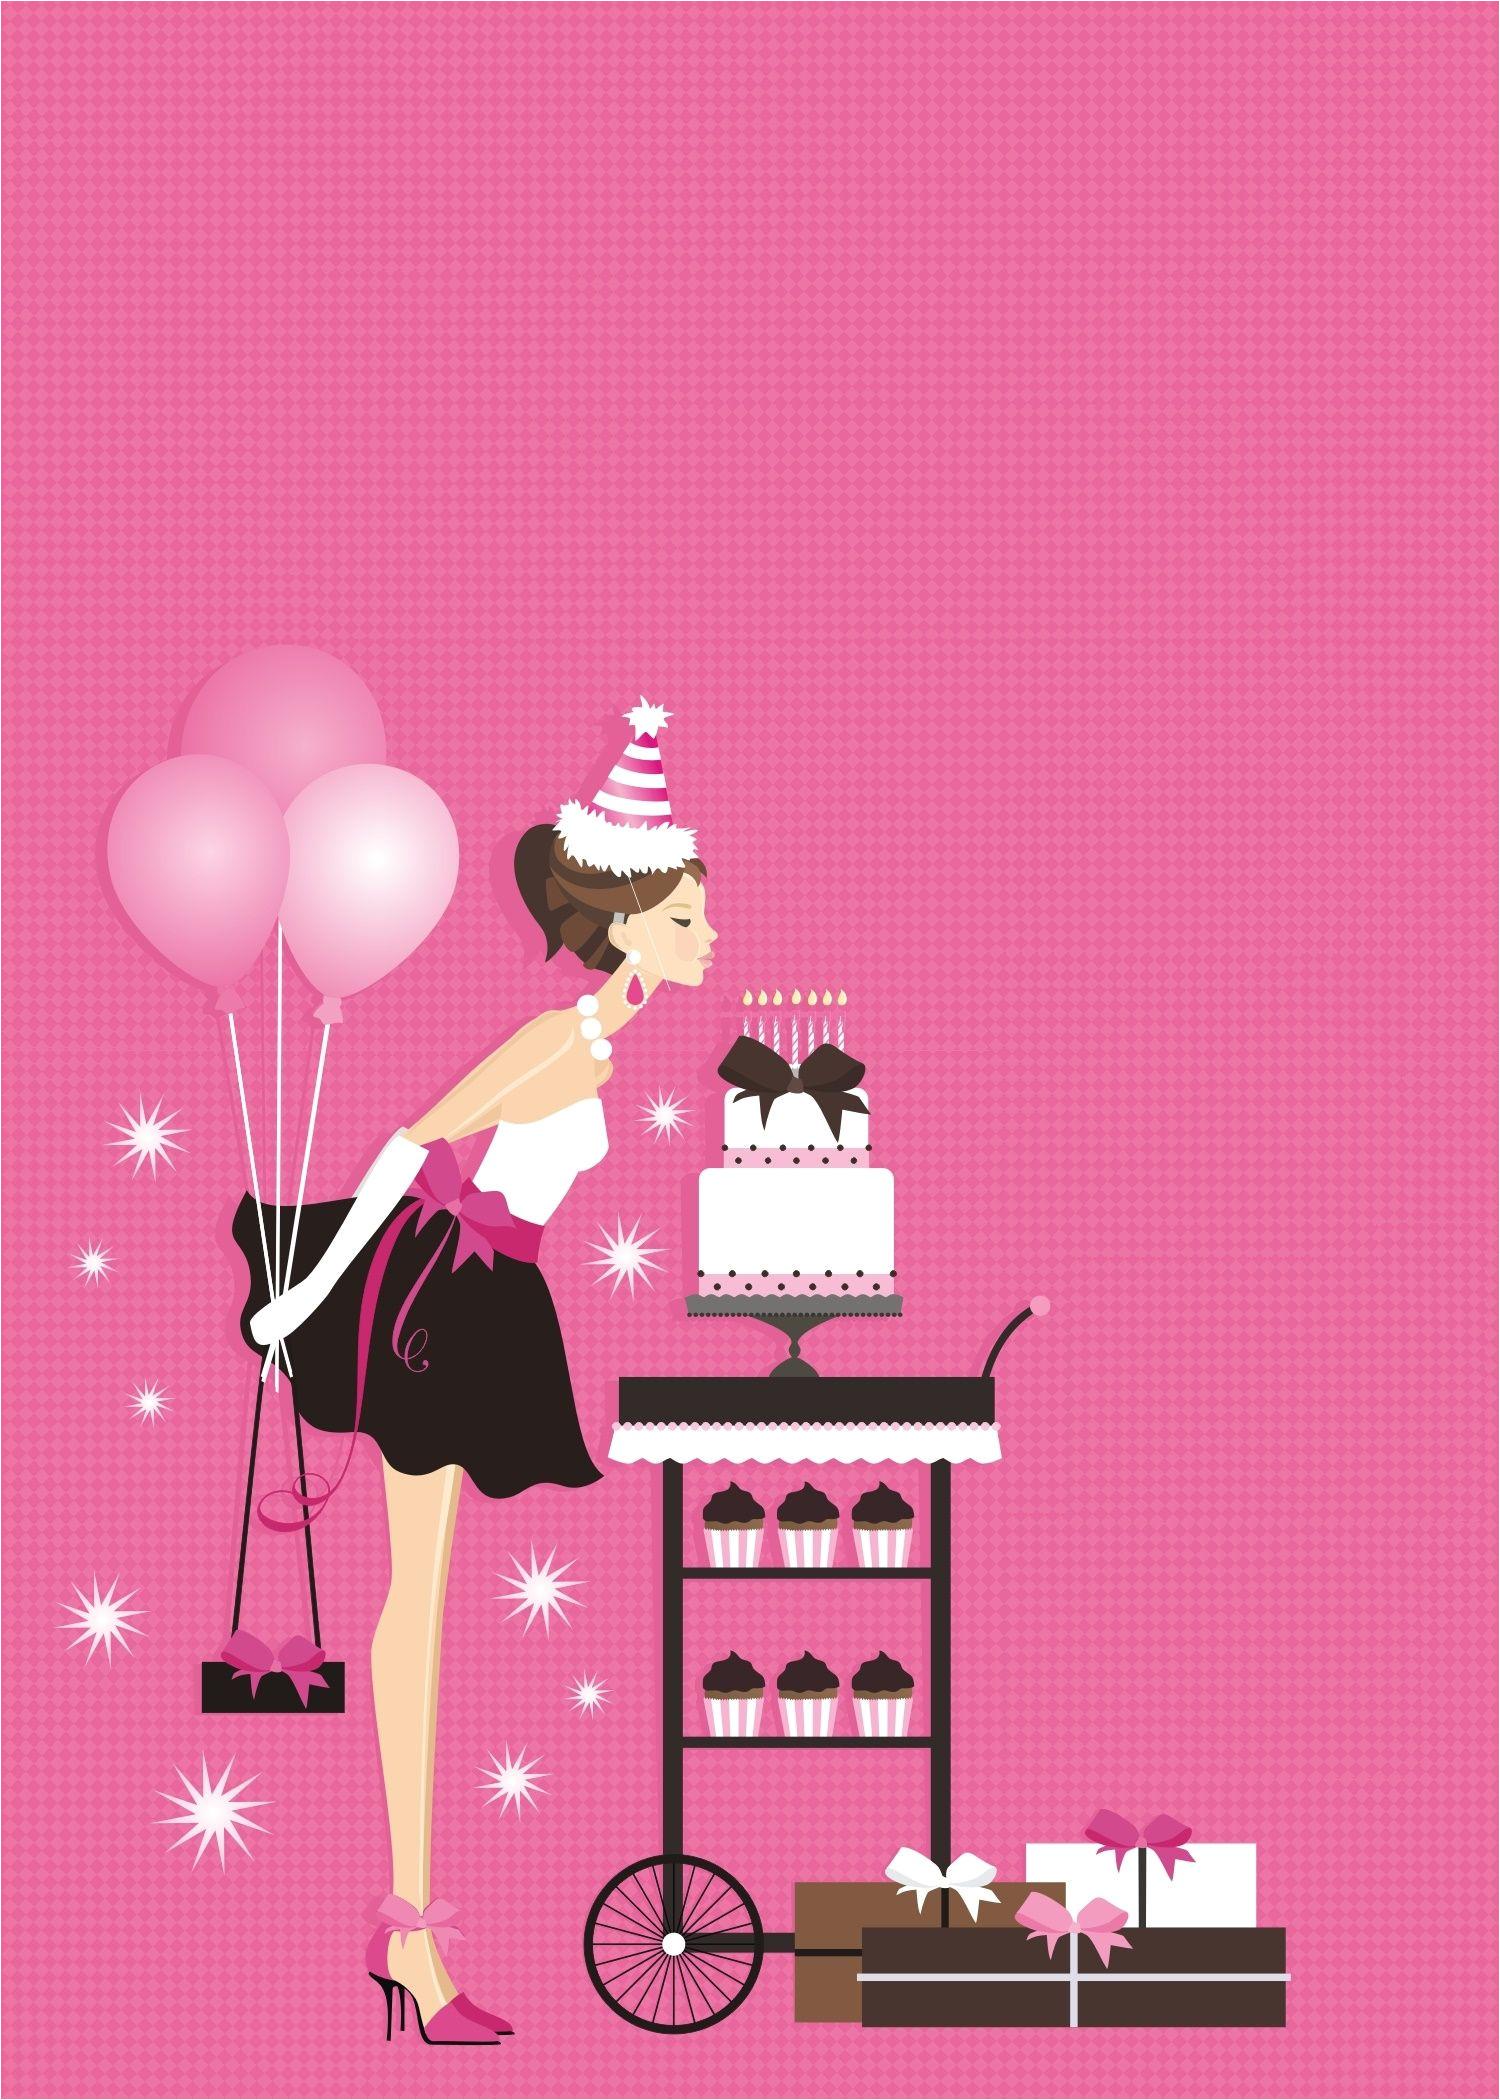 Whatsapp Invitation Card for Kitty Party Happy Birthday Jocelyn Happy Birthday Girls Happy